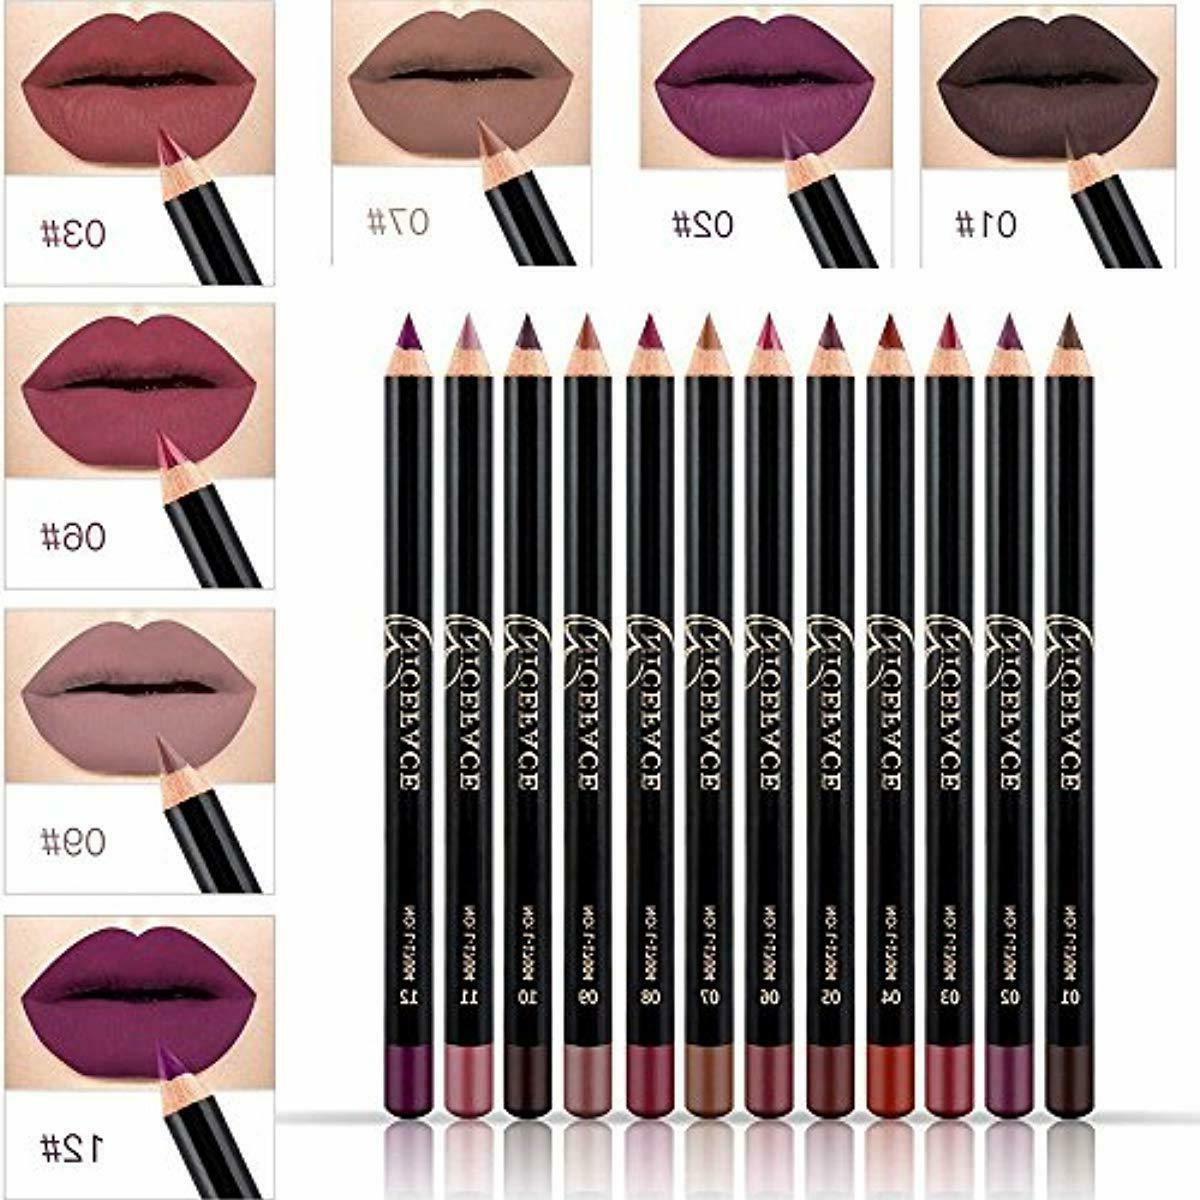 niceface 12 color lip pencil soft waterproof